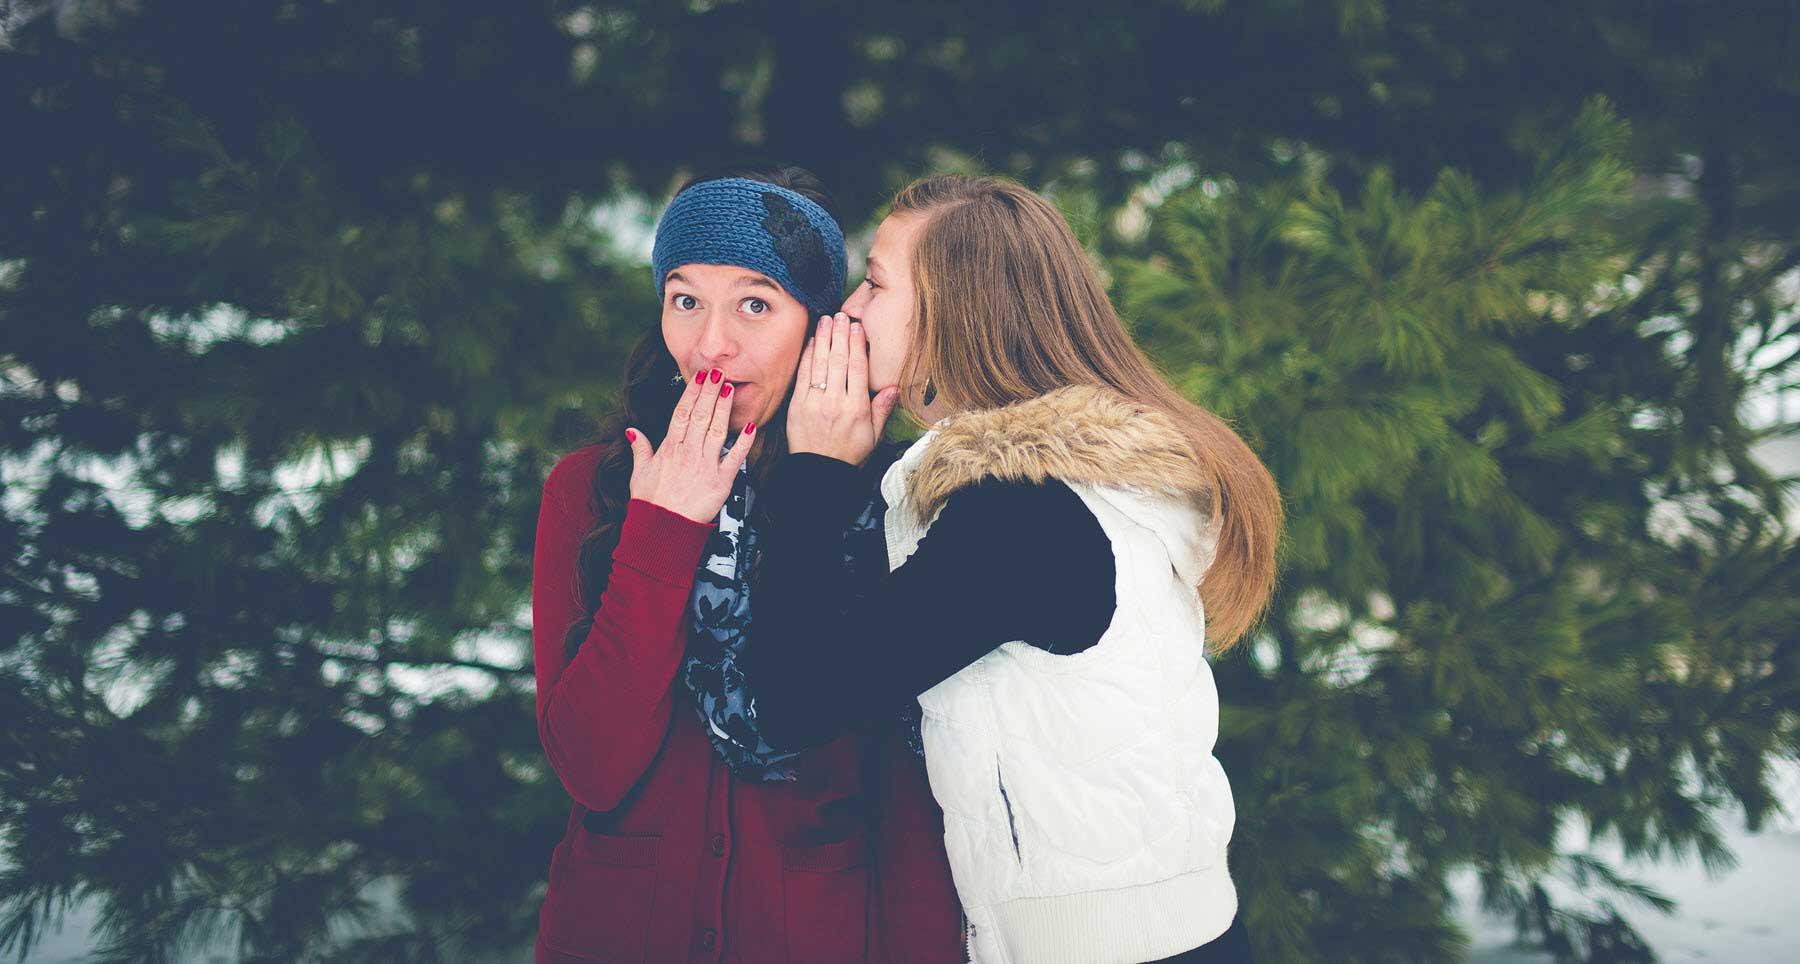 two girls spreading rumors and gossip bad reputation the danger of gossip